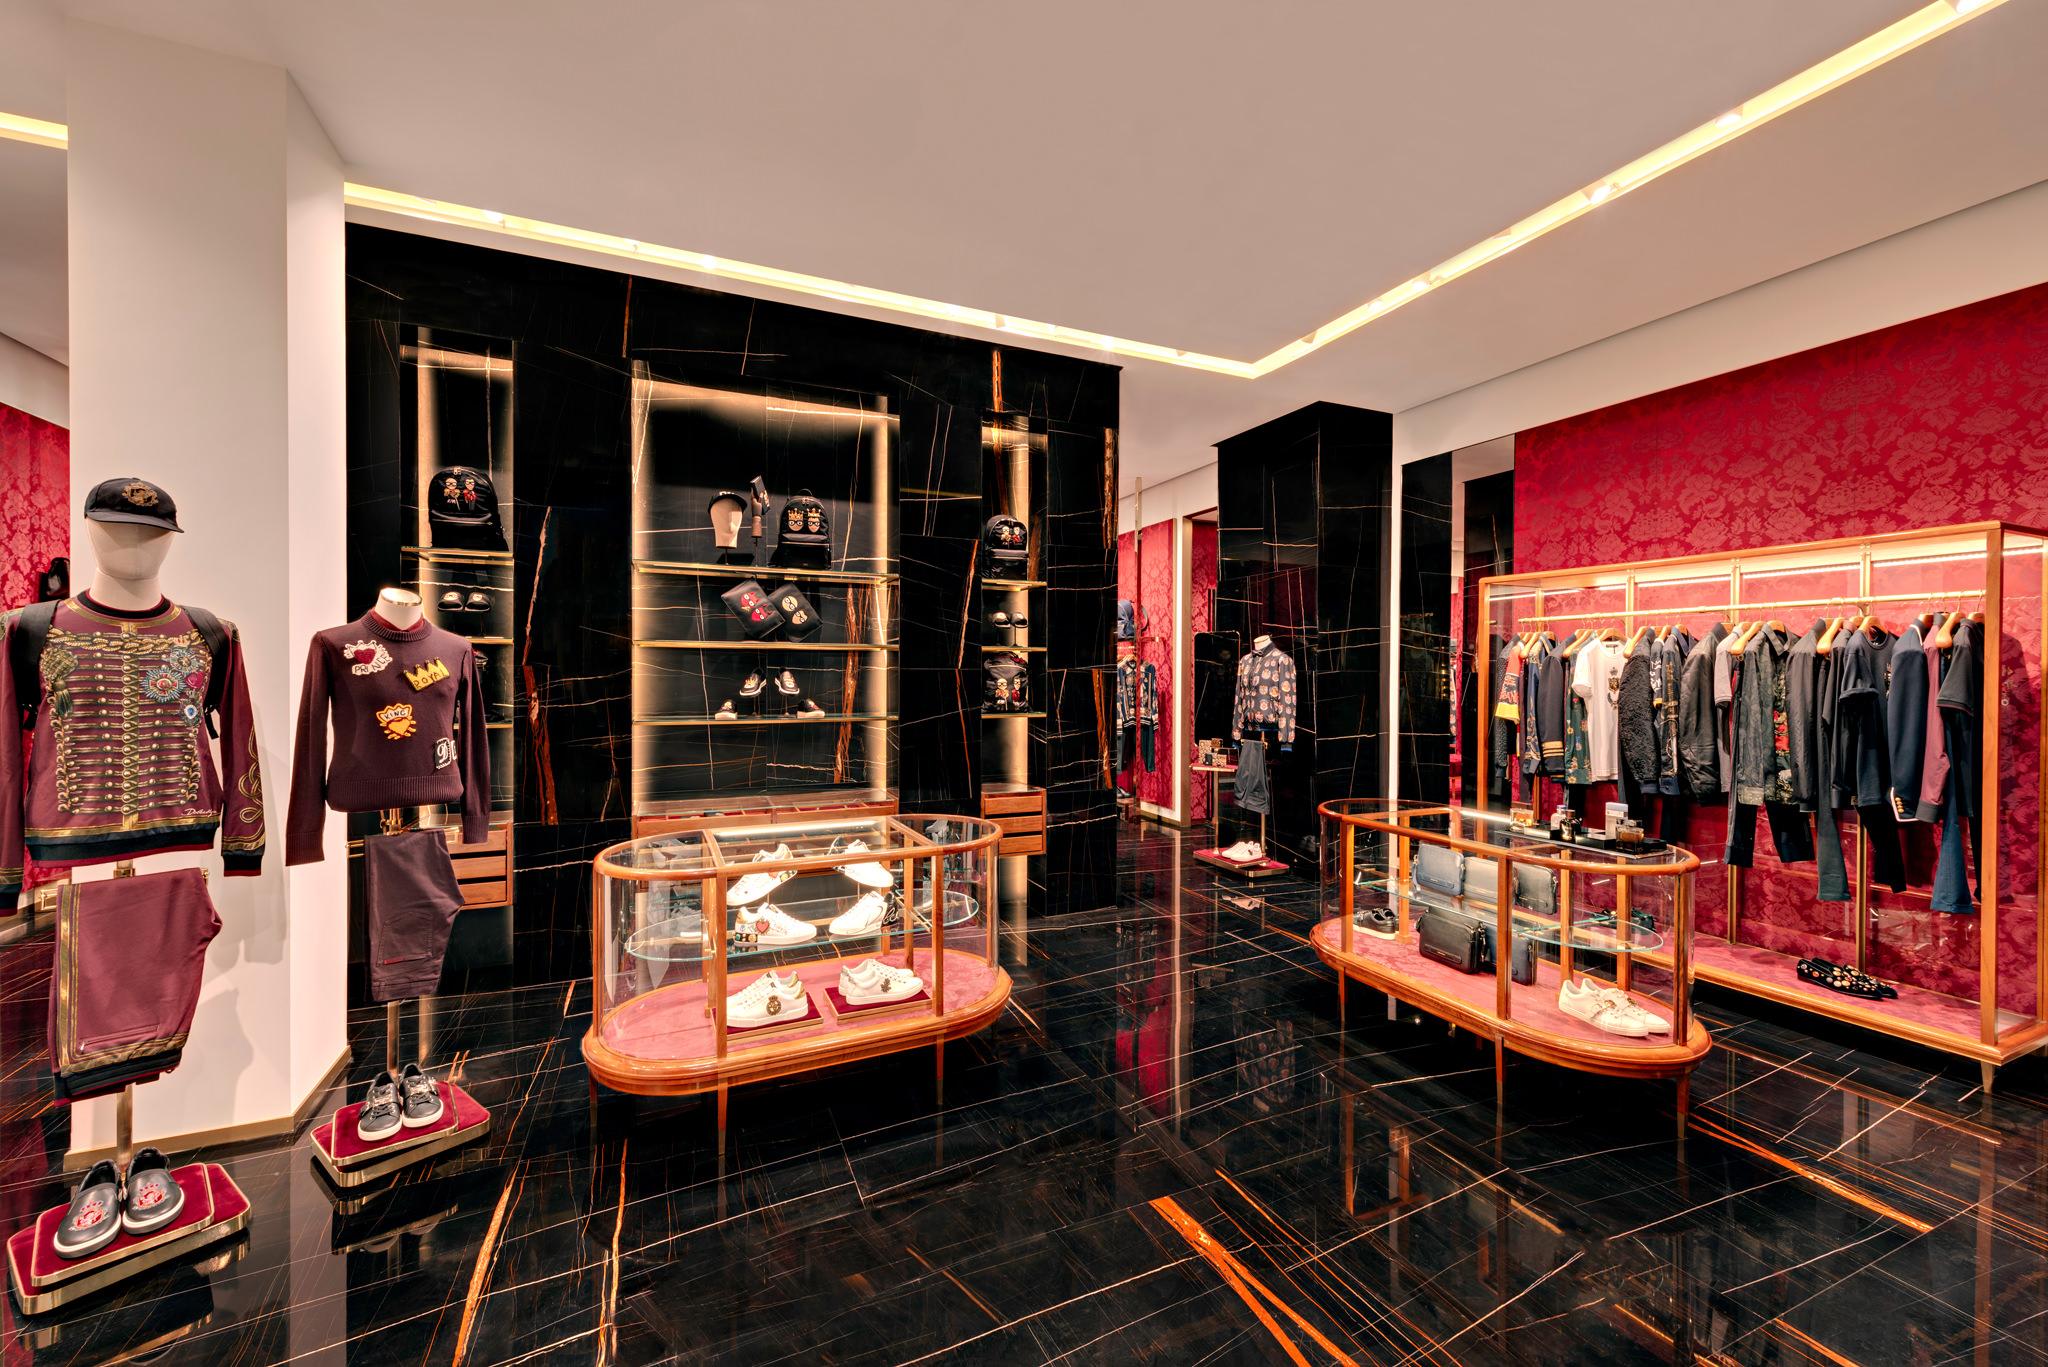 20171011 - Dolce & Gabbana - HCM - Commercial - Interior - Store - Retouch 0010.jpg